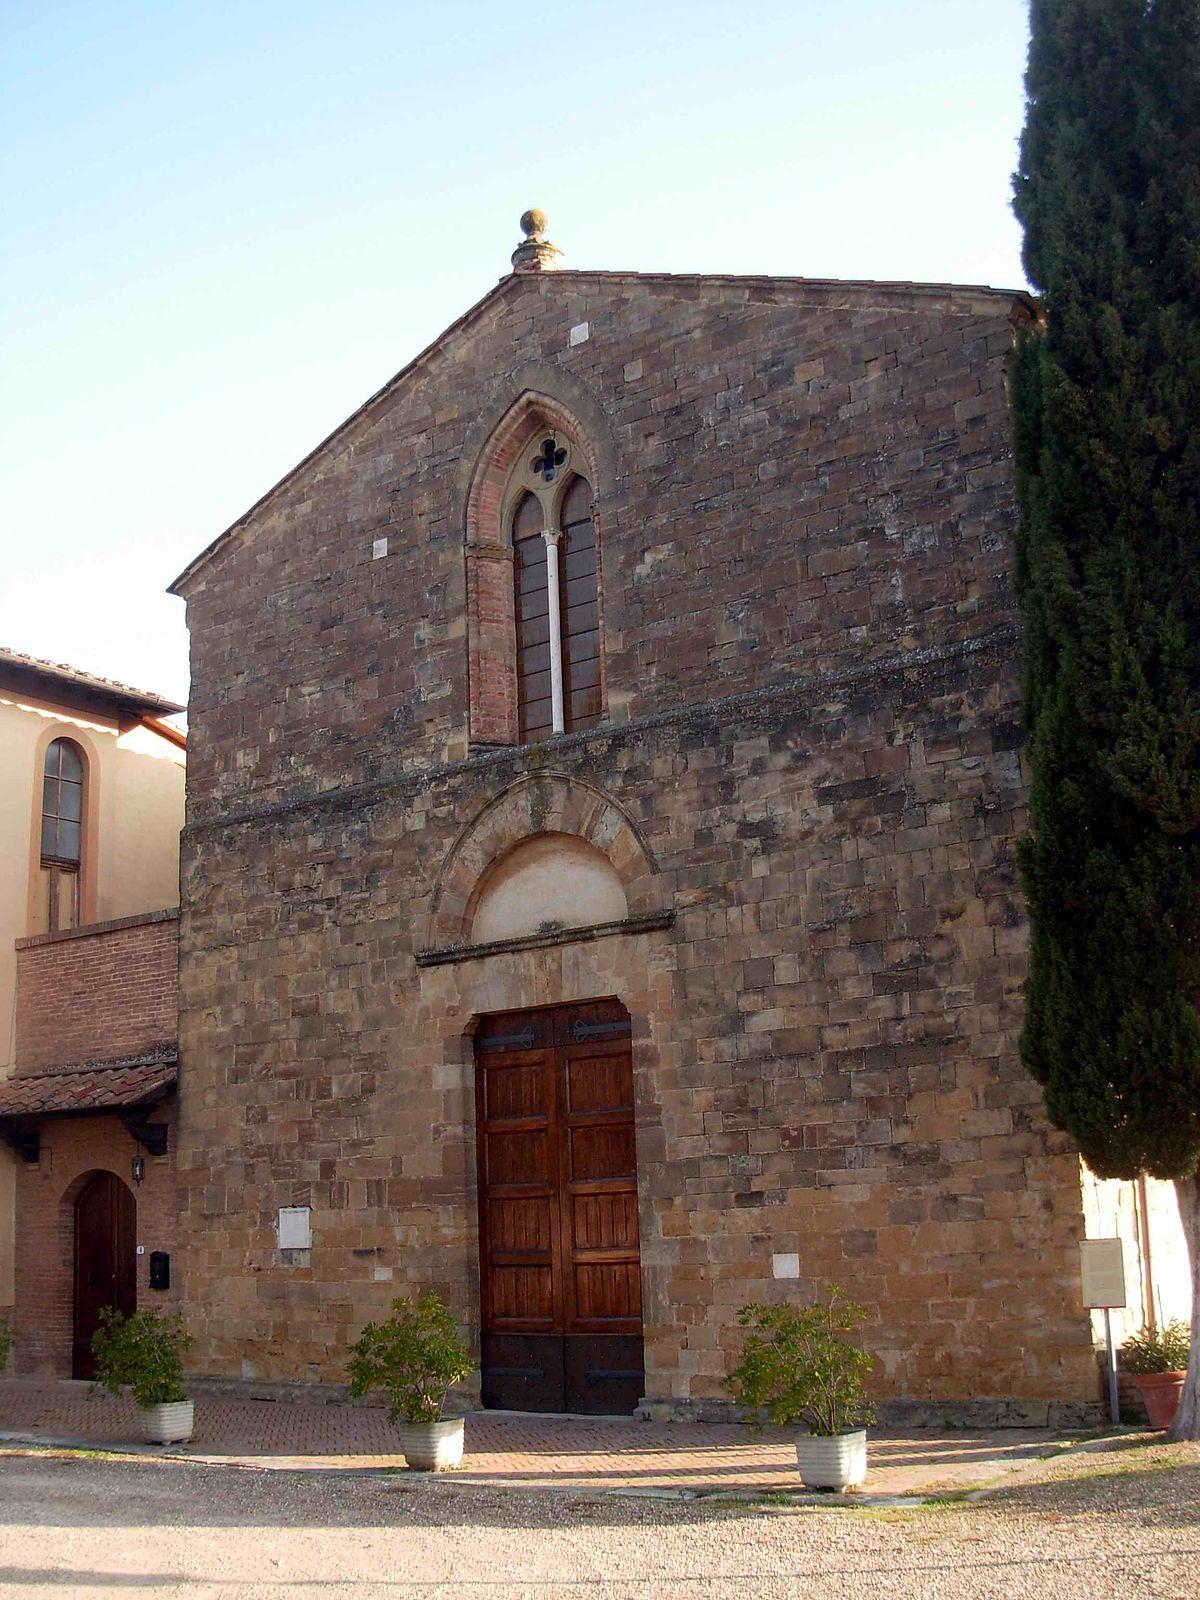 Convento di san francesco colle val d 39 elsa wikipedia for Gr2 arredamenti colle val d elsa